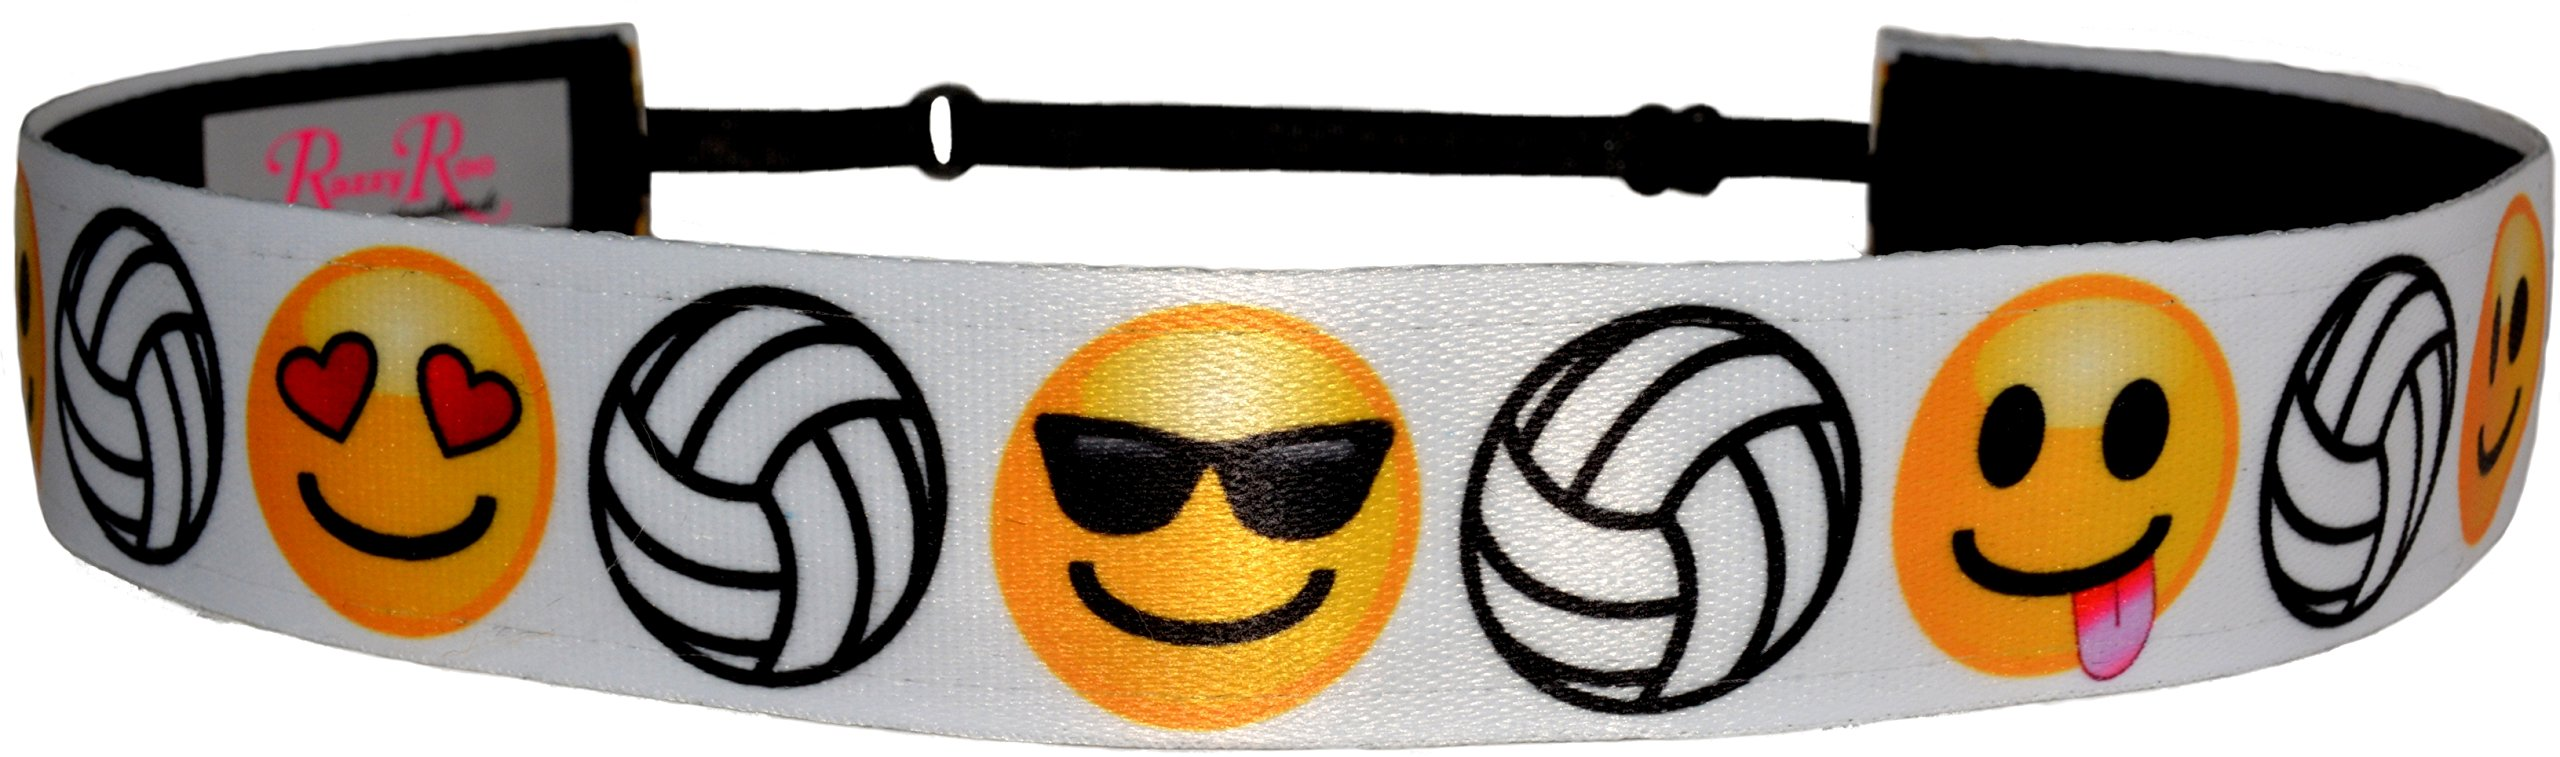 Non Slip Adjustable Headband ''Emoji Volleyball'' Smiley Faces Girls Volleyball Headband by RazzyRoo Headbands by RazzyRoo Headbands (Image #2)